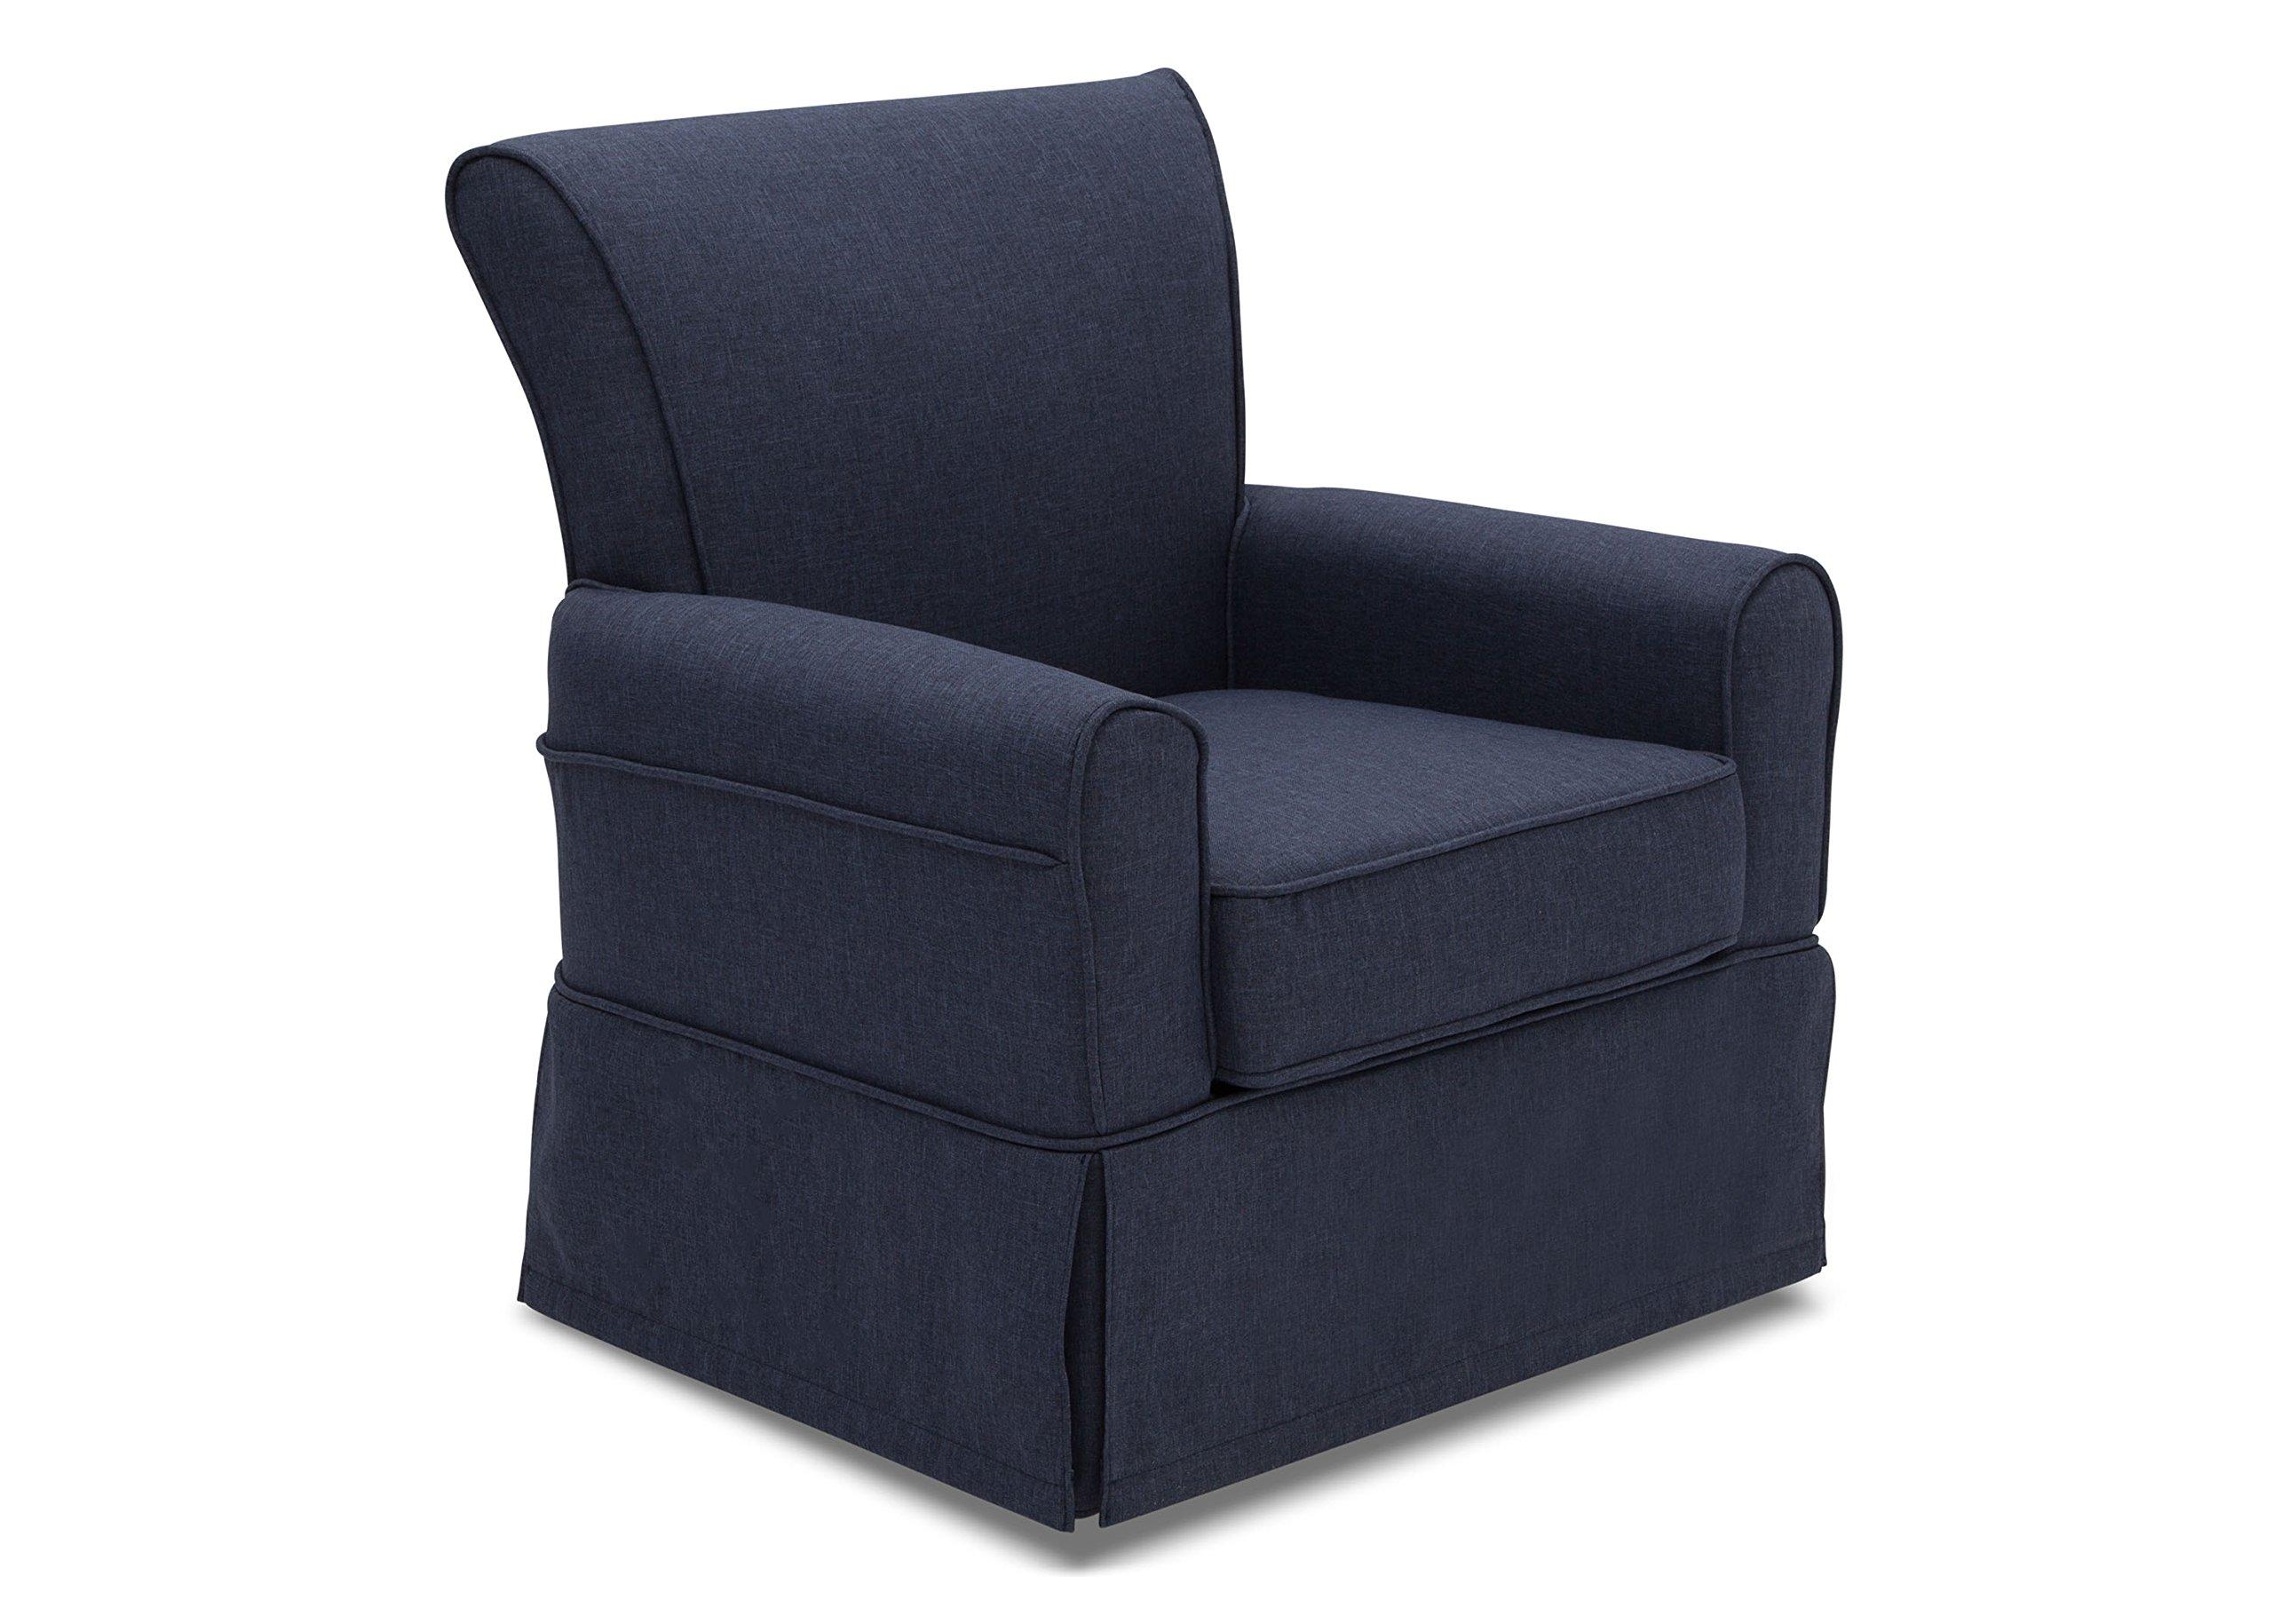 Delta Furniture Upholstered Glider Swivel Rocker Chair, Sailor Blue